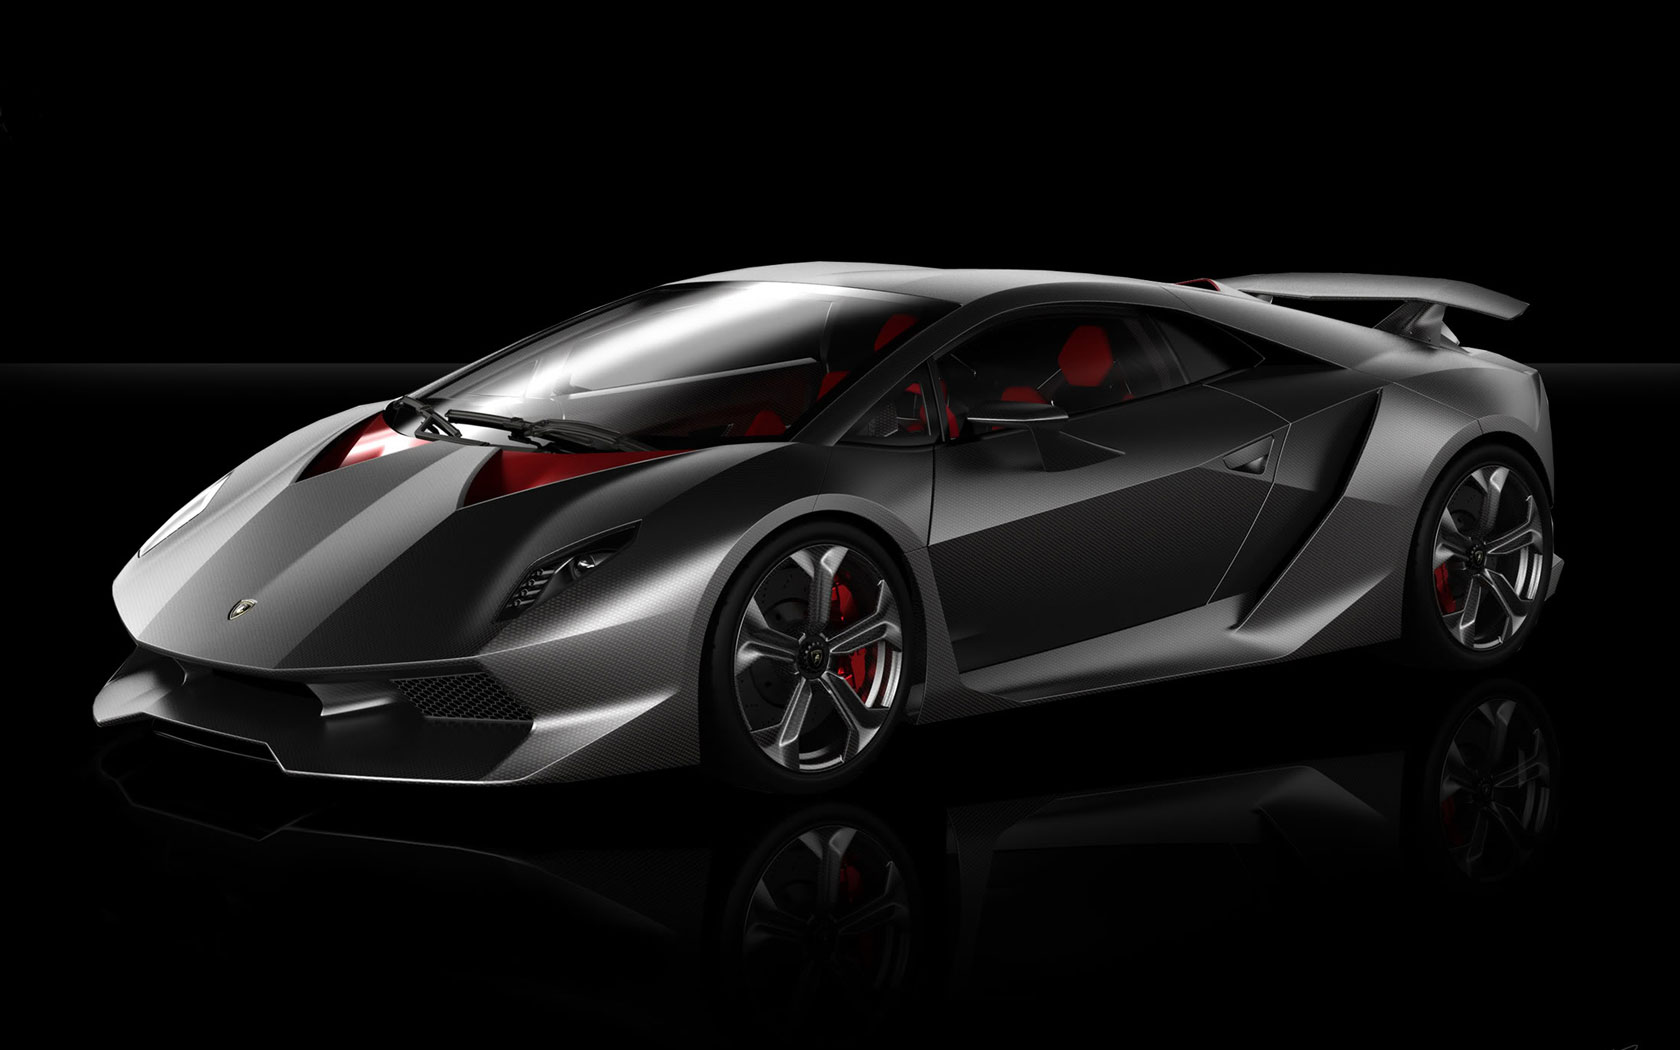 Lamborghini-Sesto-Elemento-4.jpg